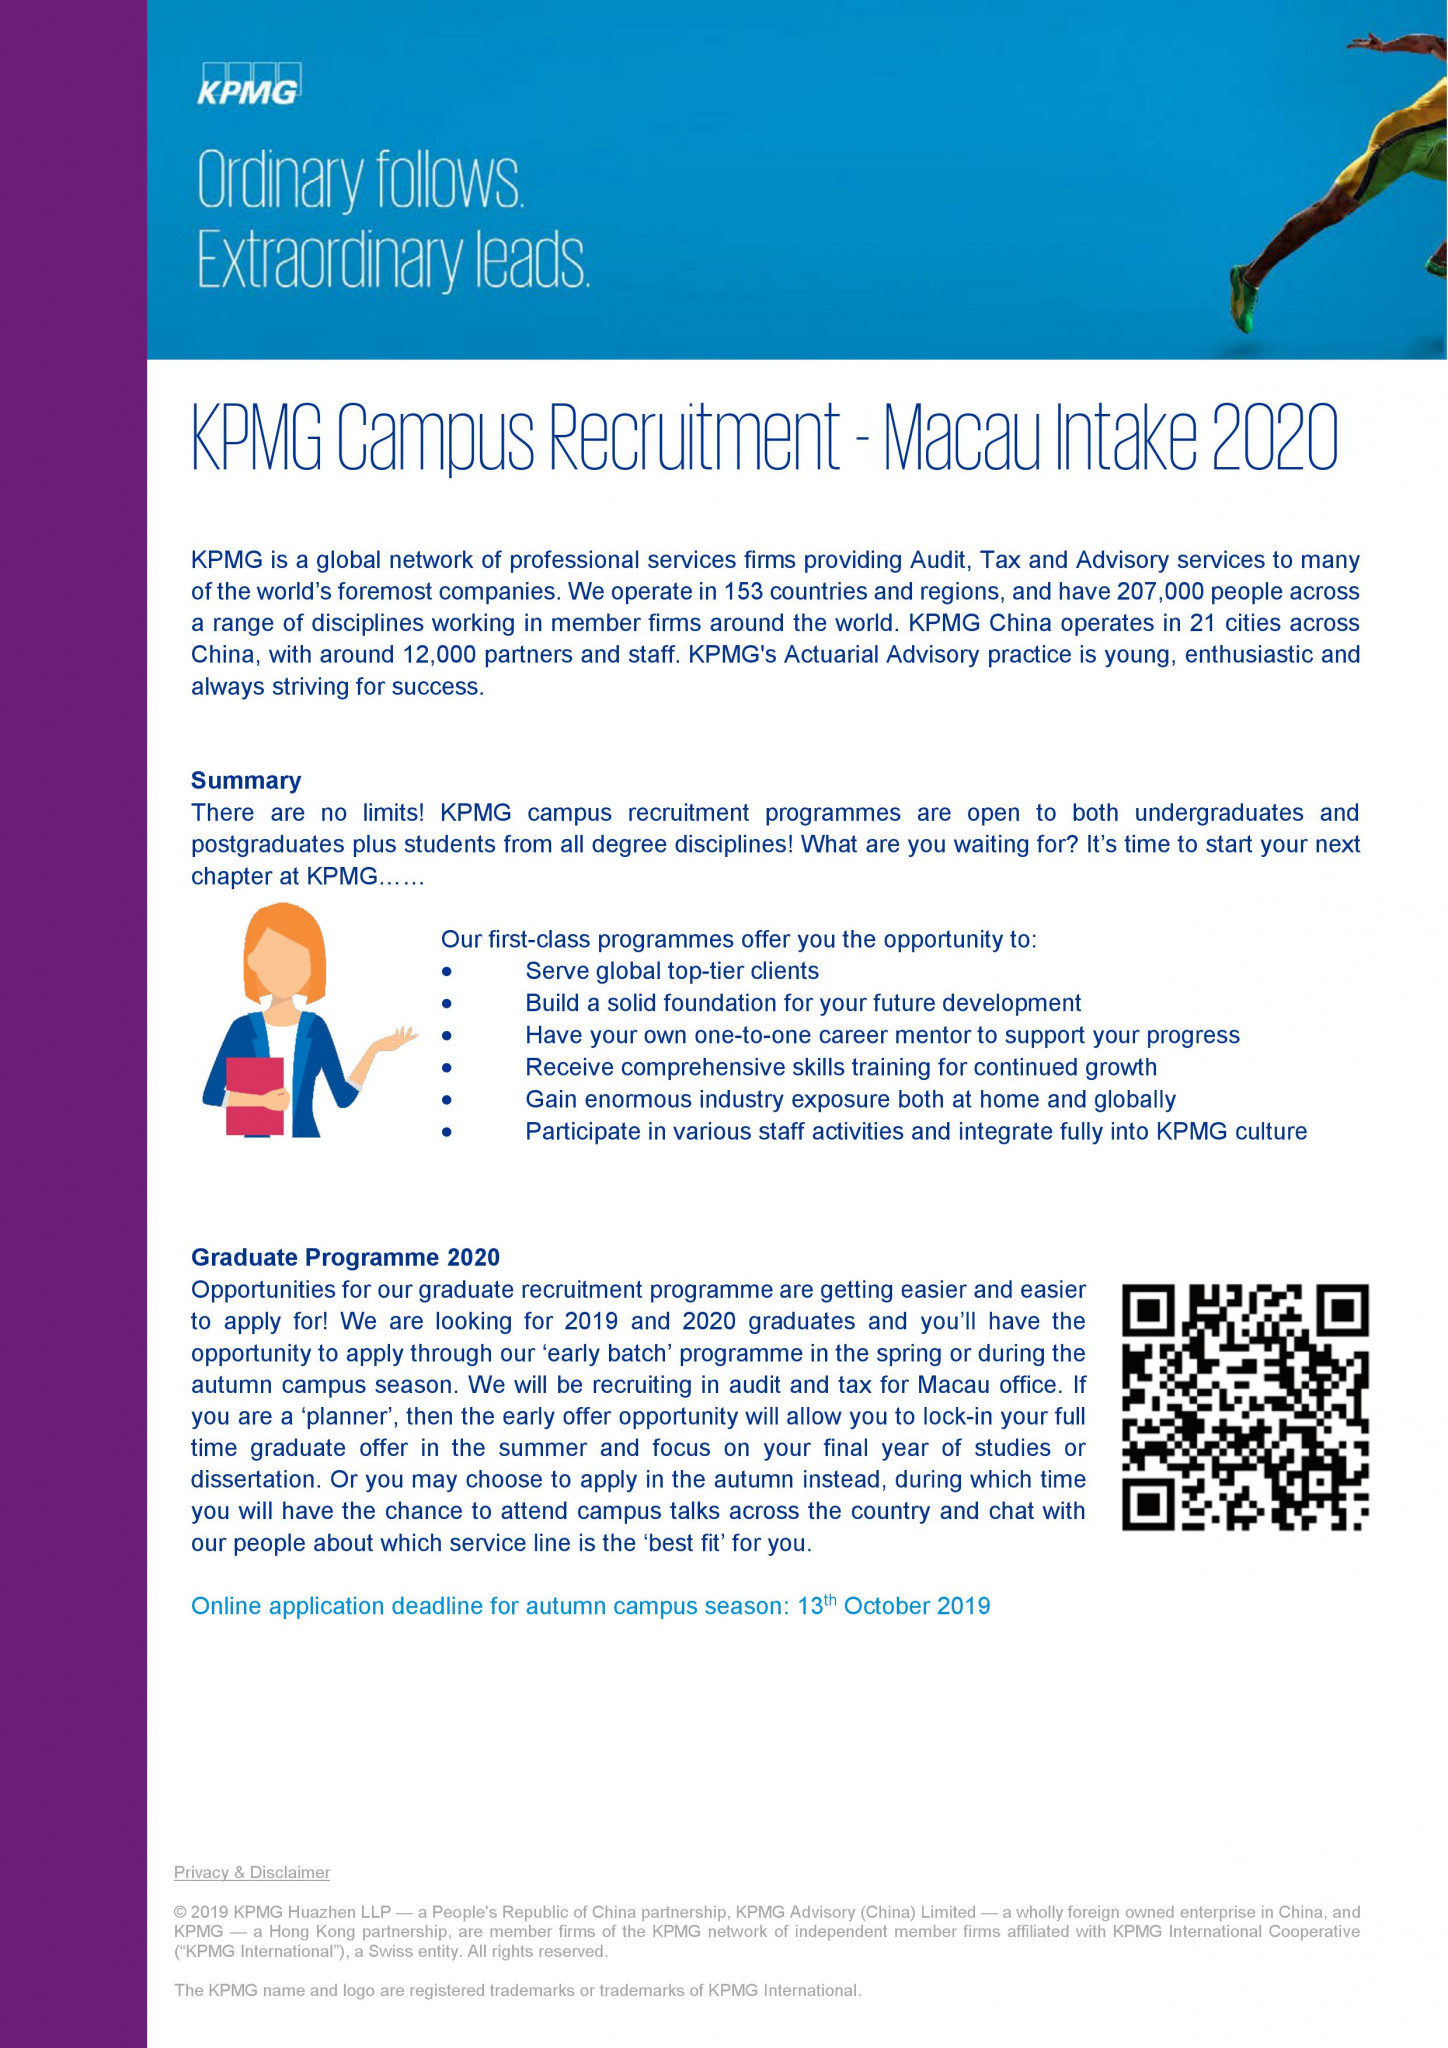 KPMG Graduate Programme 2020 - Faculty of Business